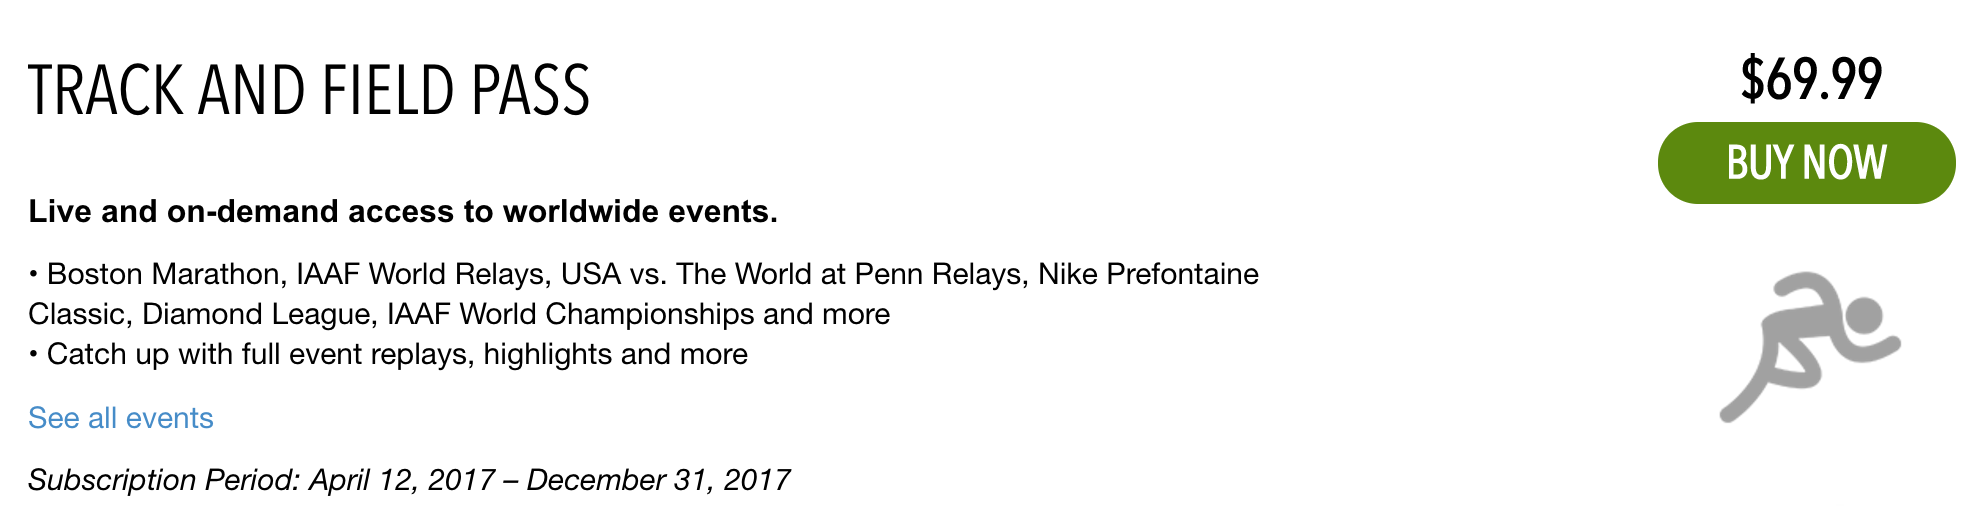 NBC Diamond League Track and Field Pass